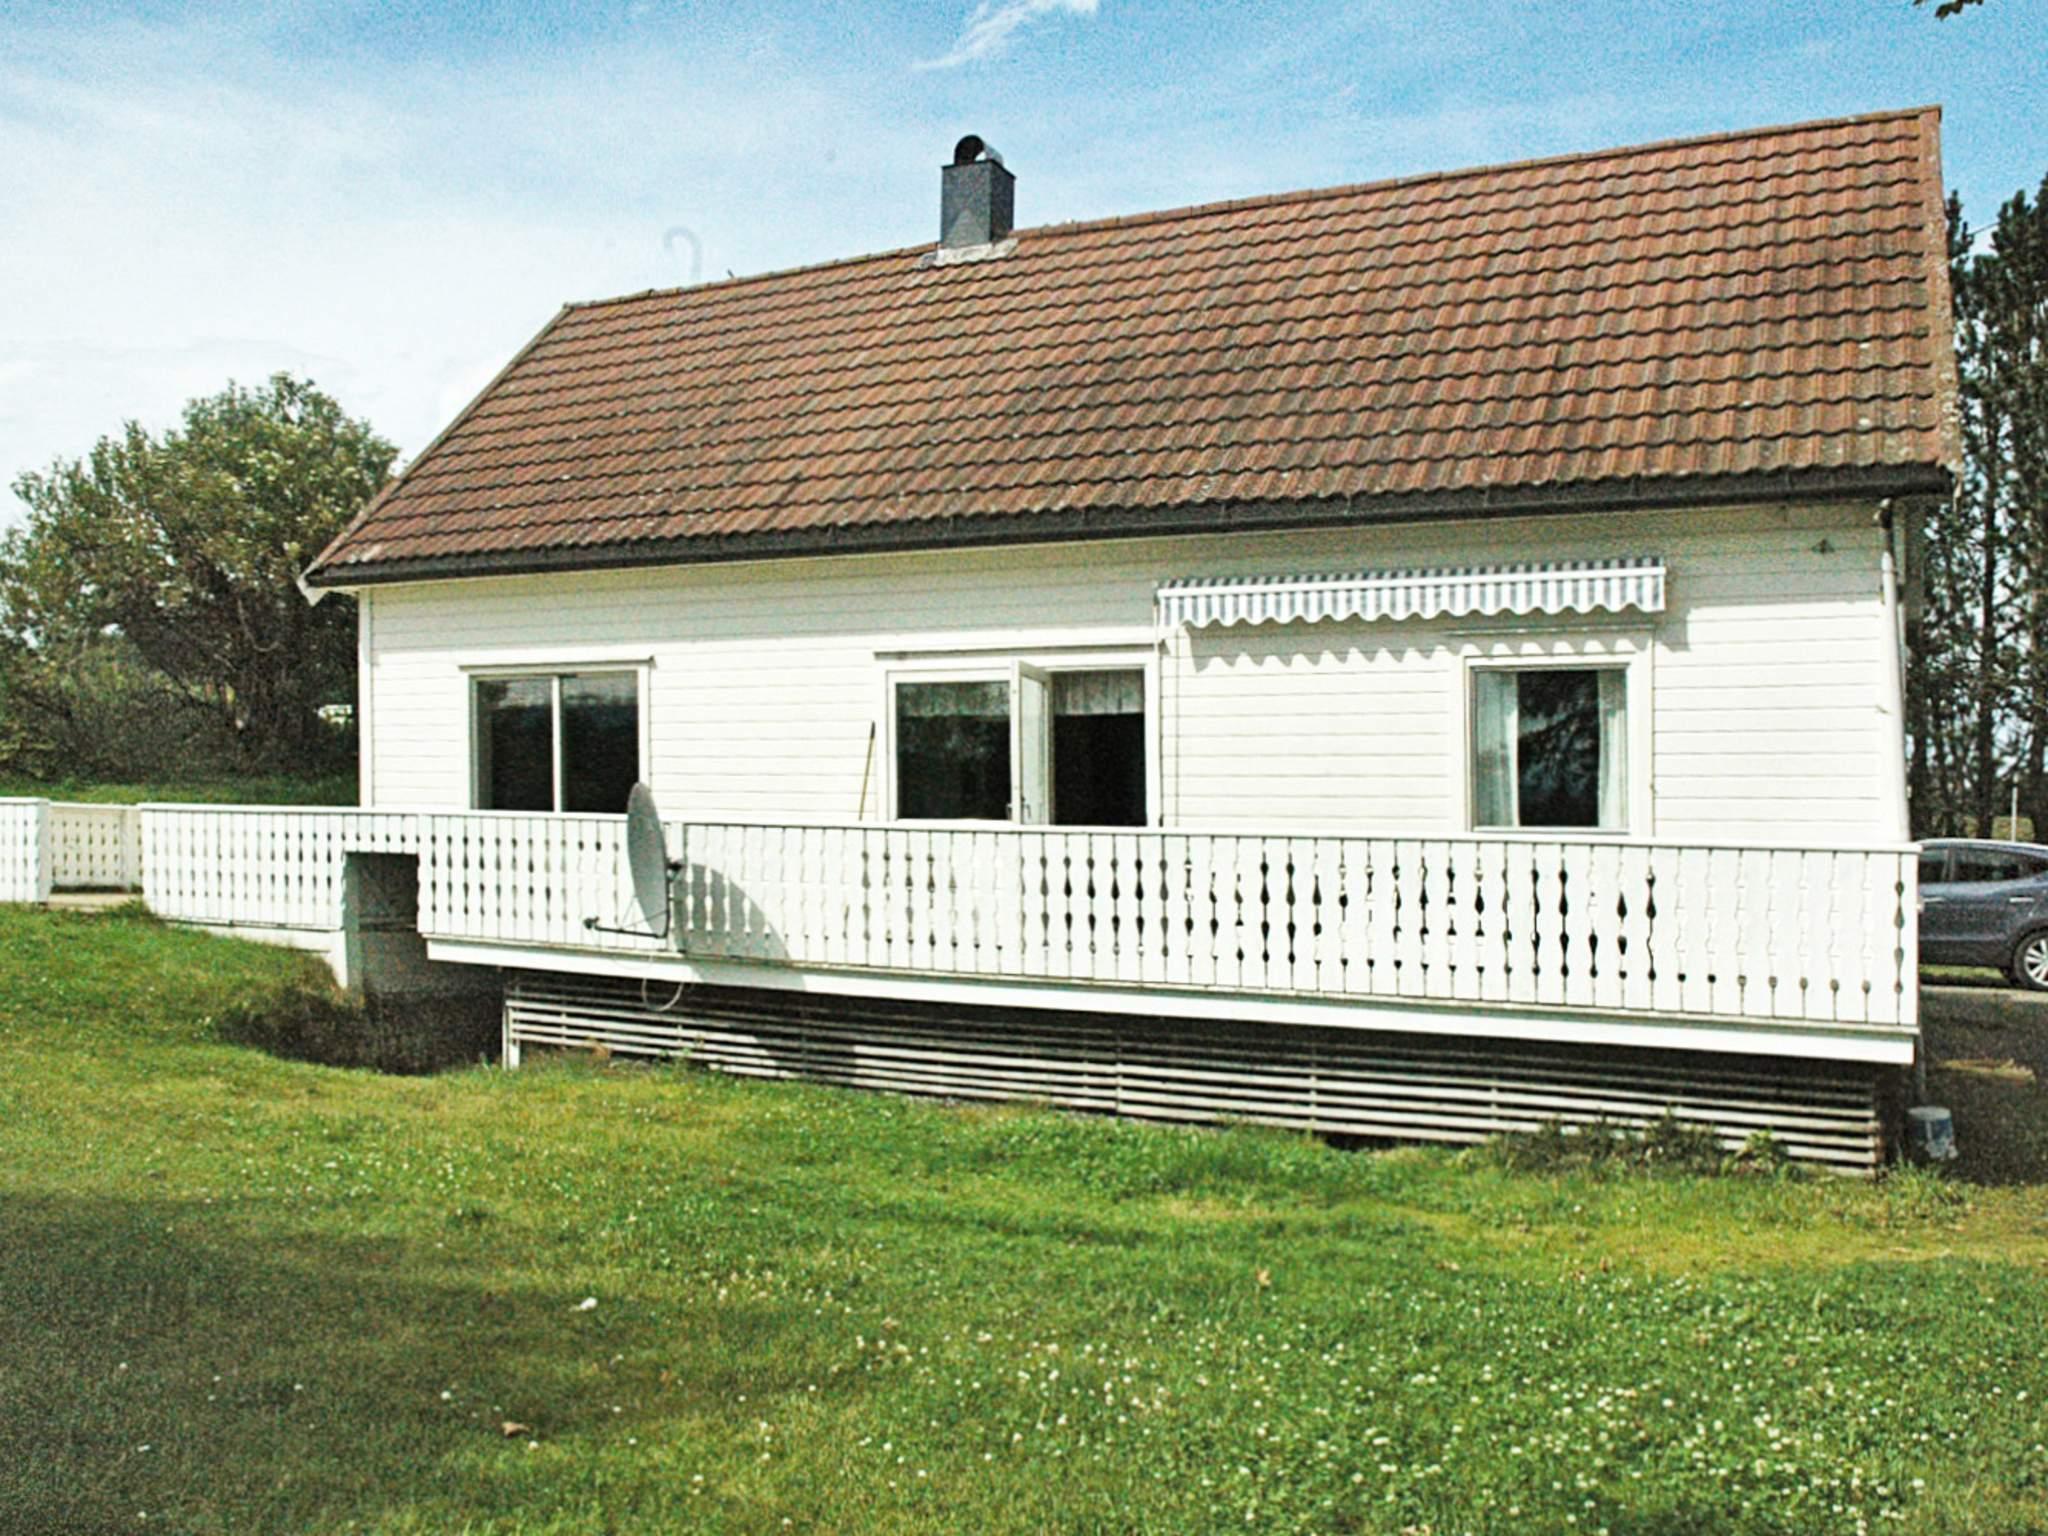 Ferienhaus Vevang (85080), Vevang, More - Romsdal, Westnorwegen, Norwegen, Bild 17